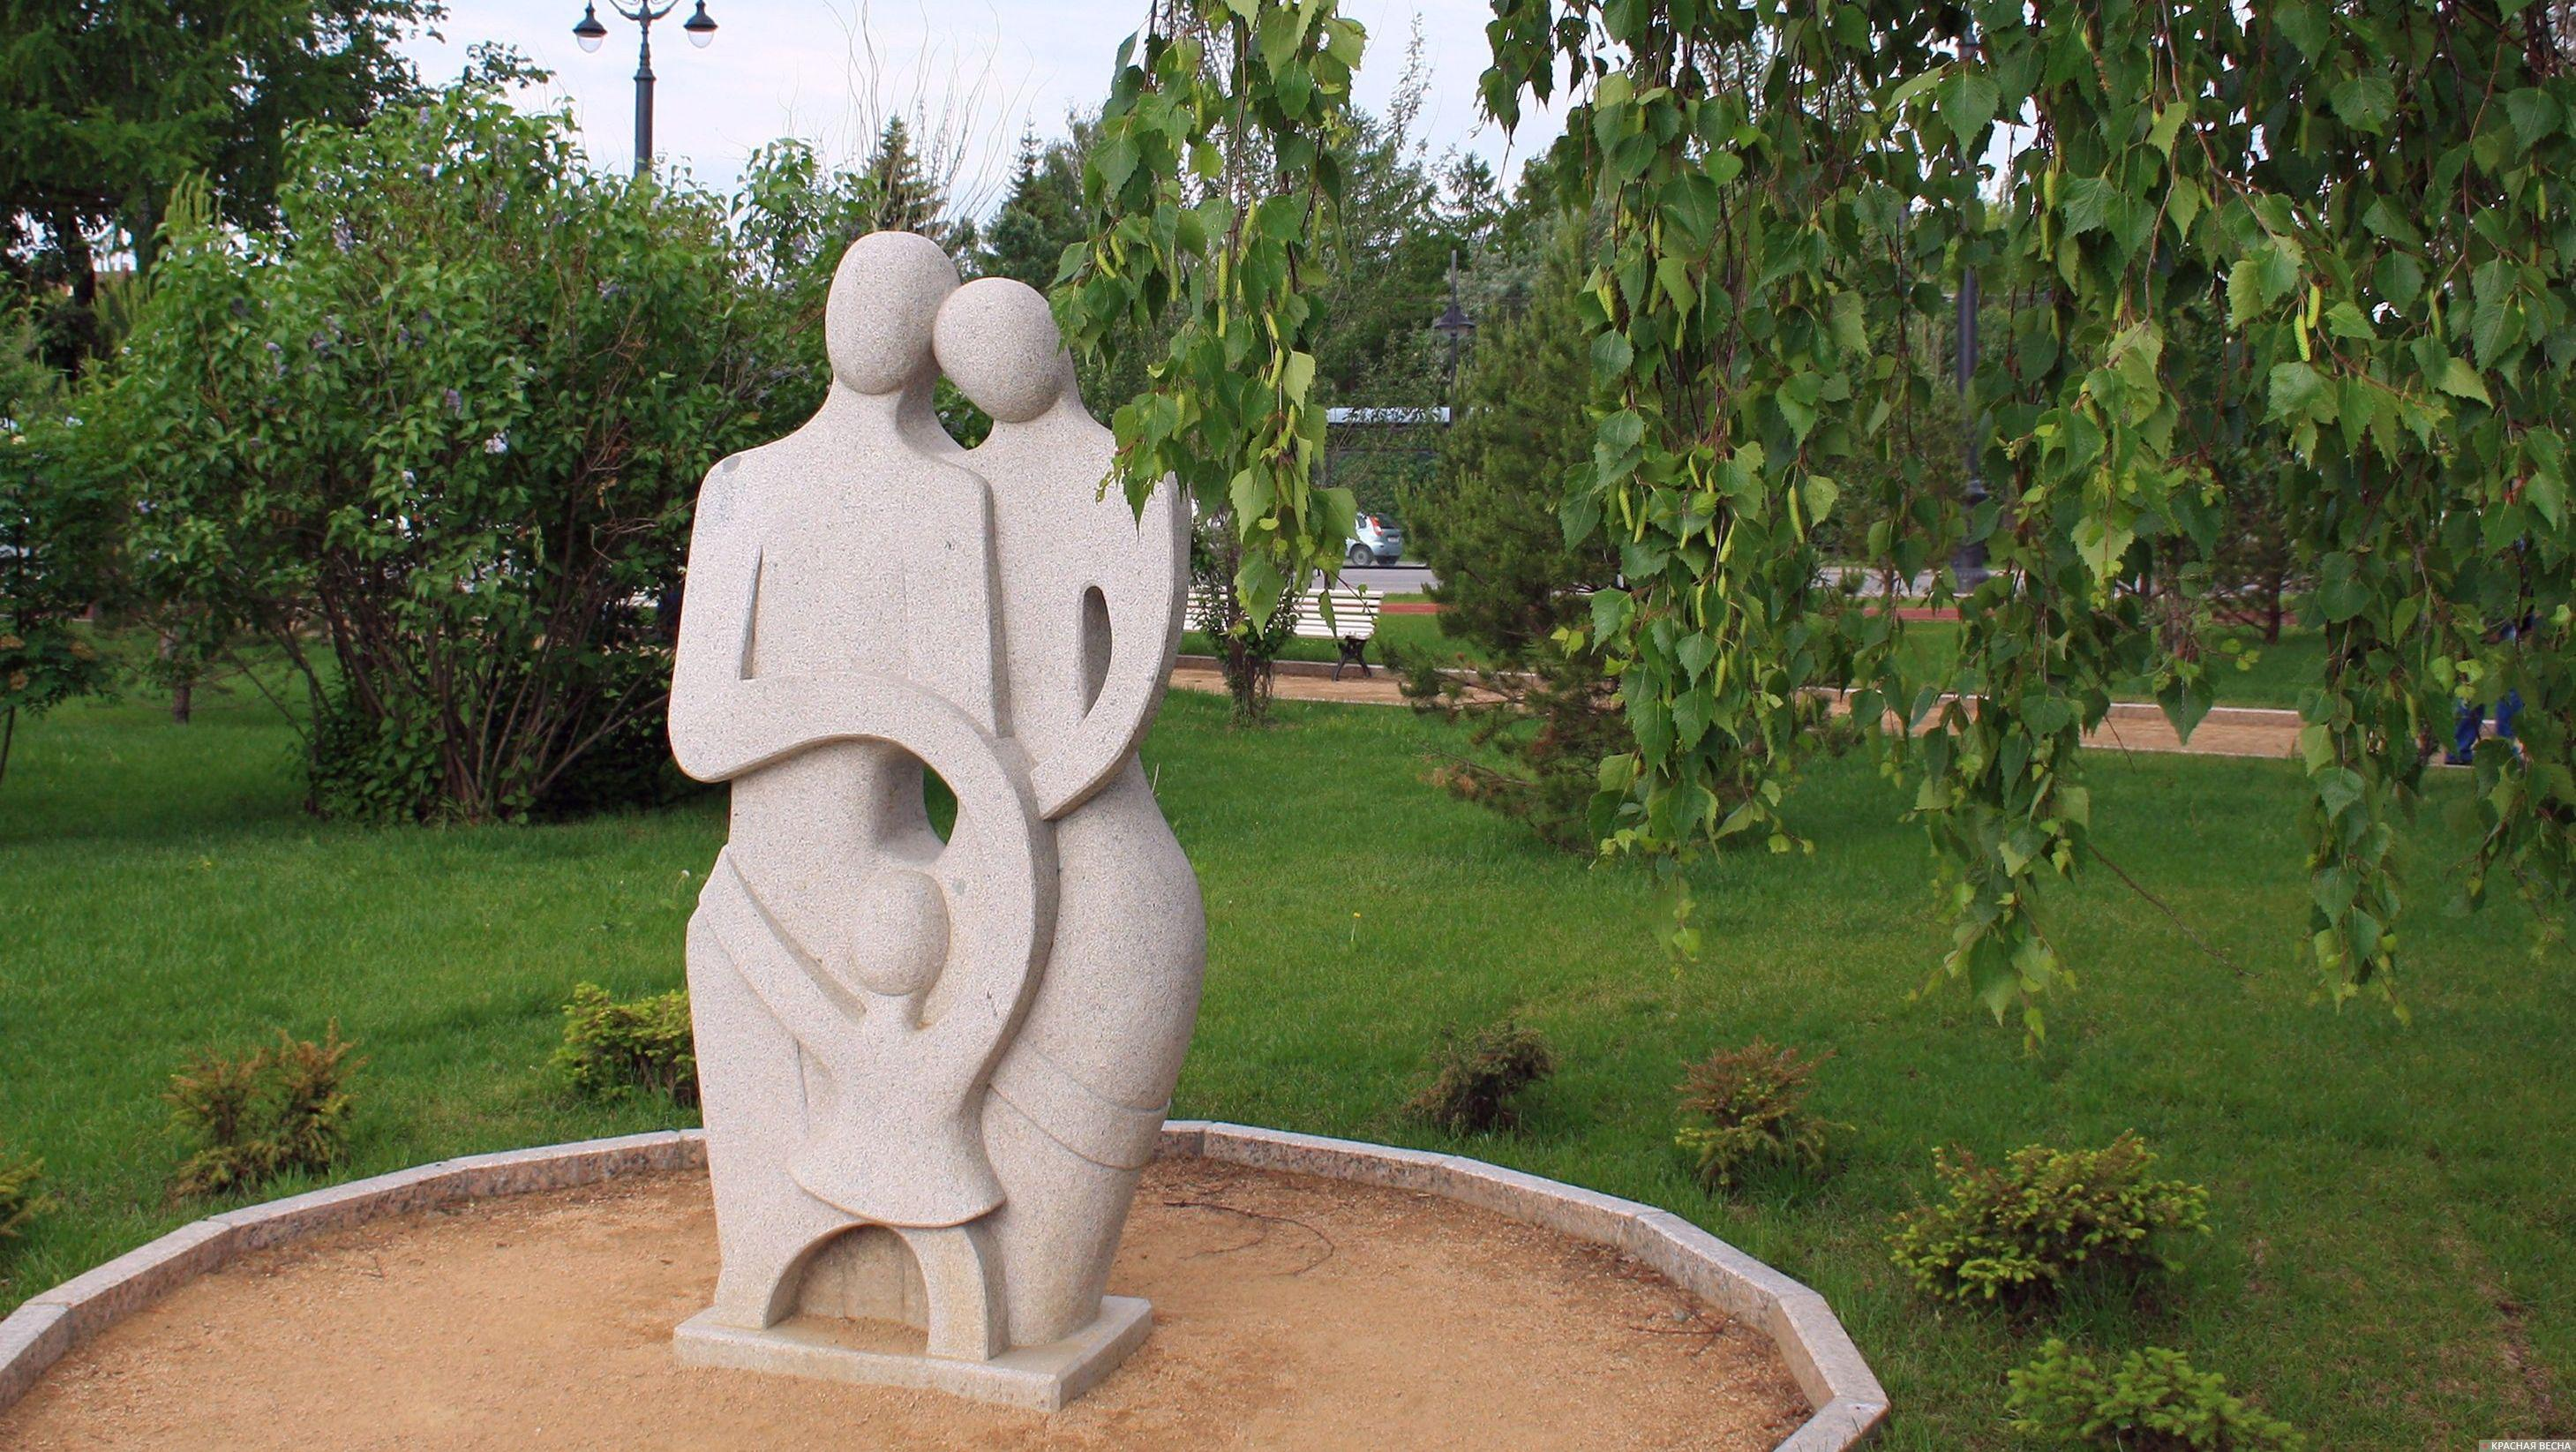 Семья. Композиция из камня. Омск Анна Рыжкова © ИА Красная Весна